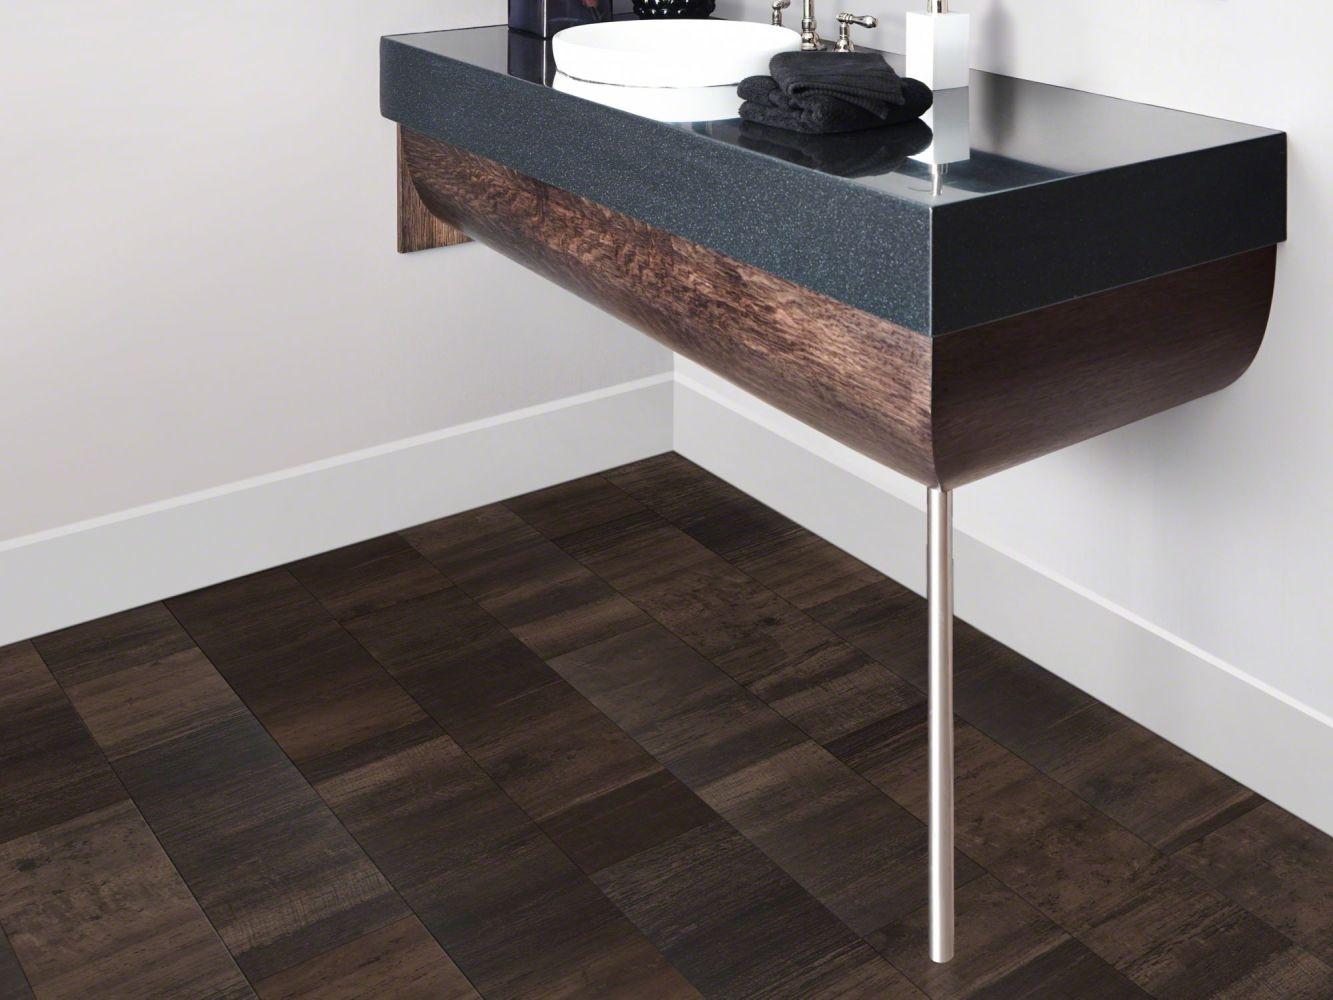 Shaw Floors Resilient Residential Bartram Plank Eastwick 00727_0415V